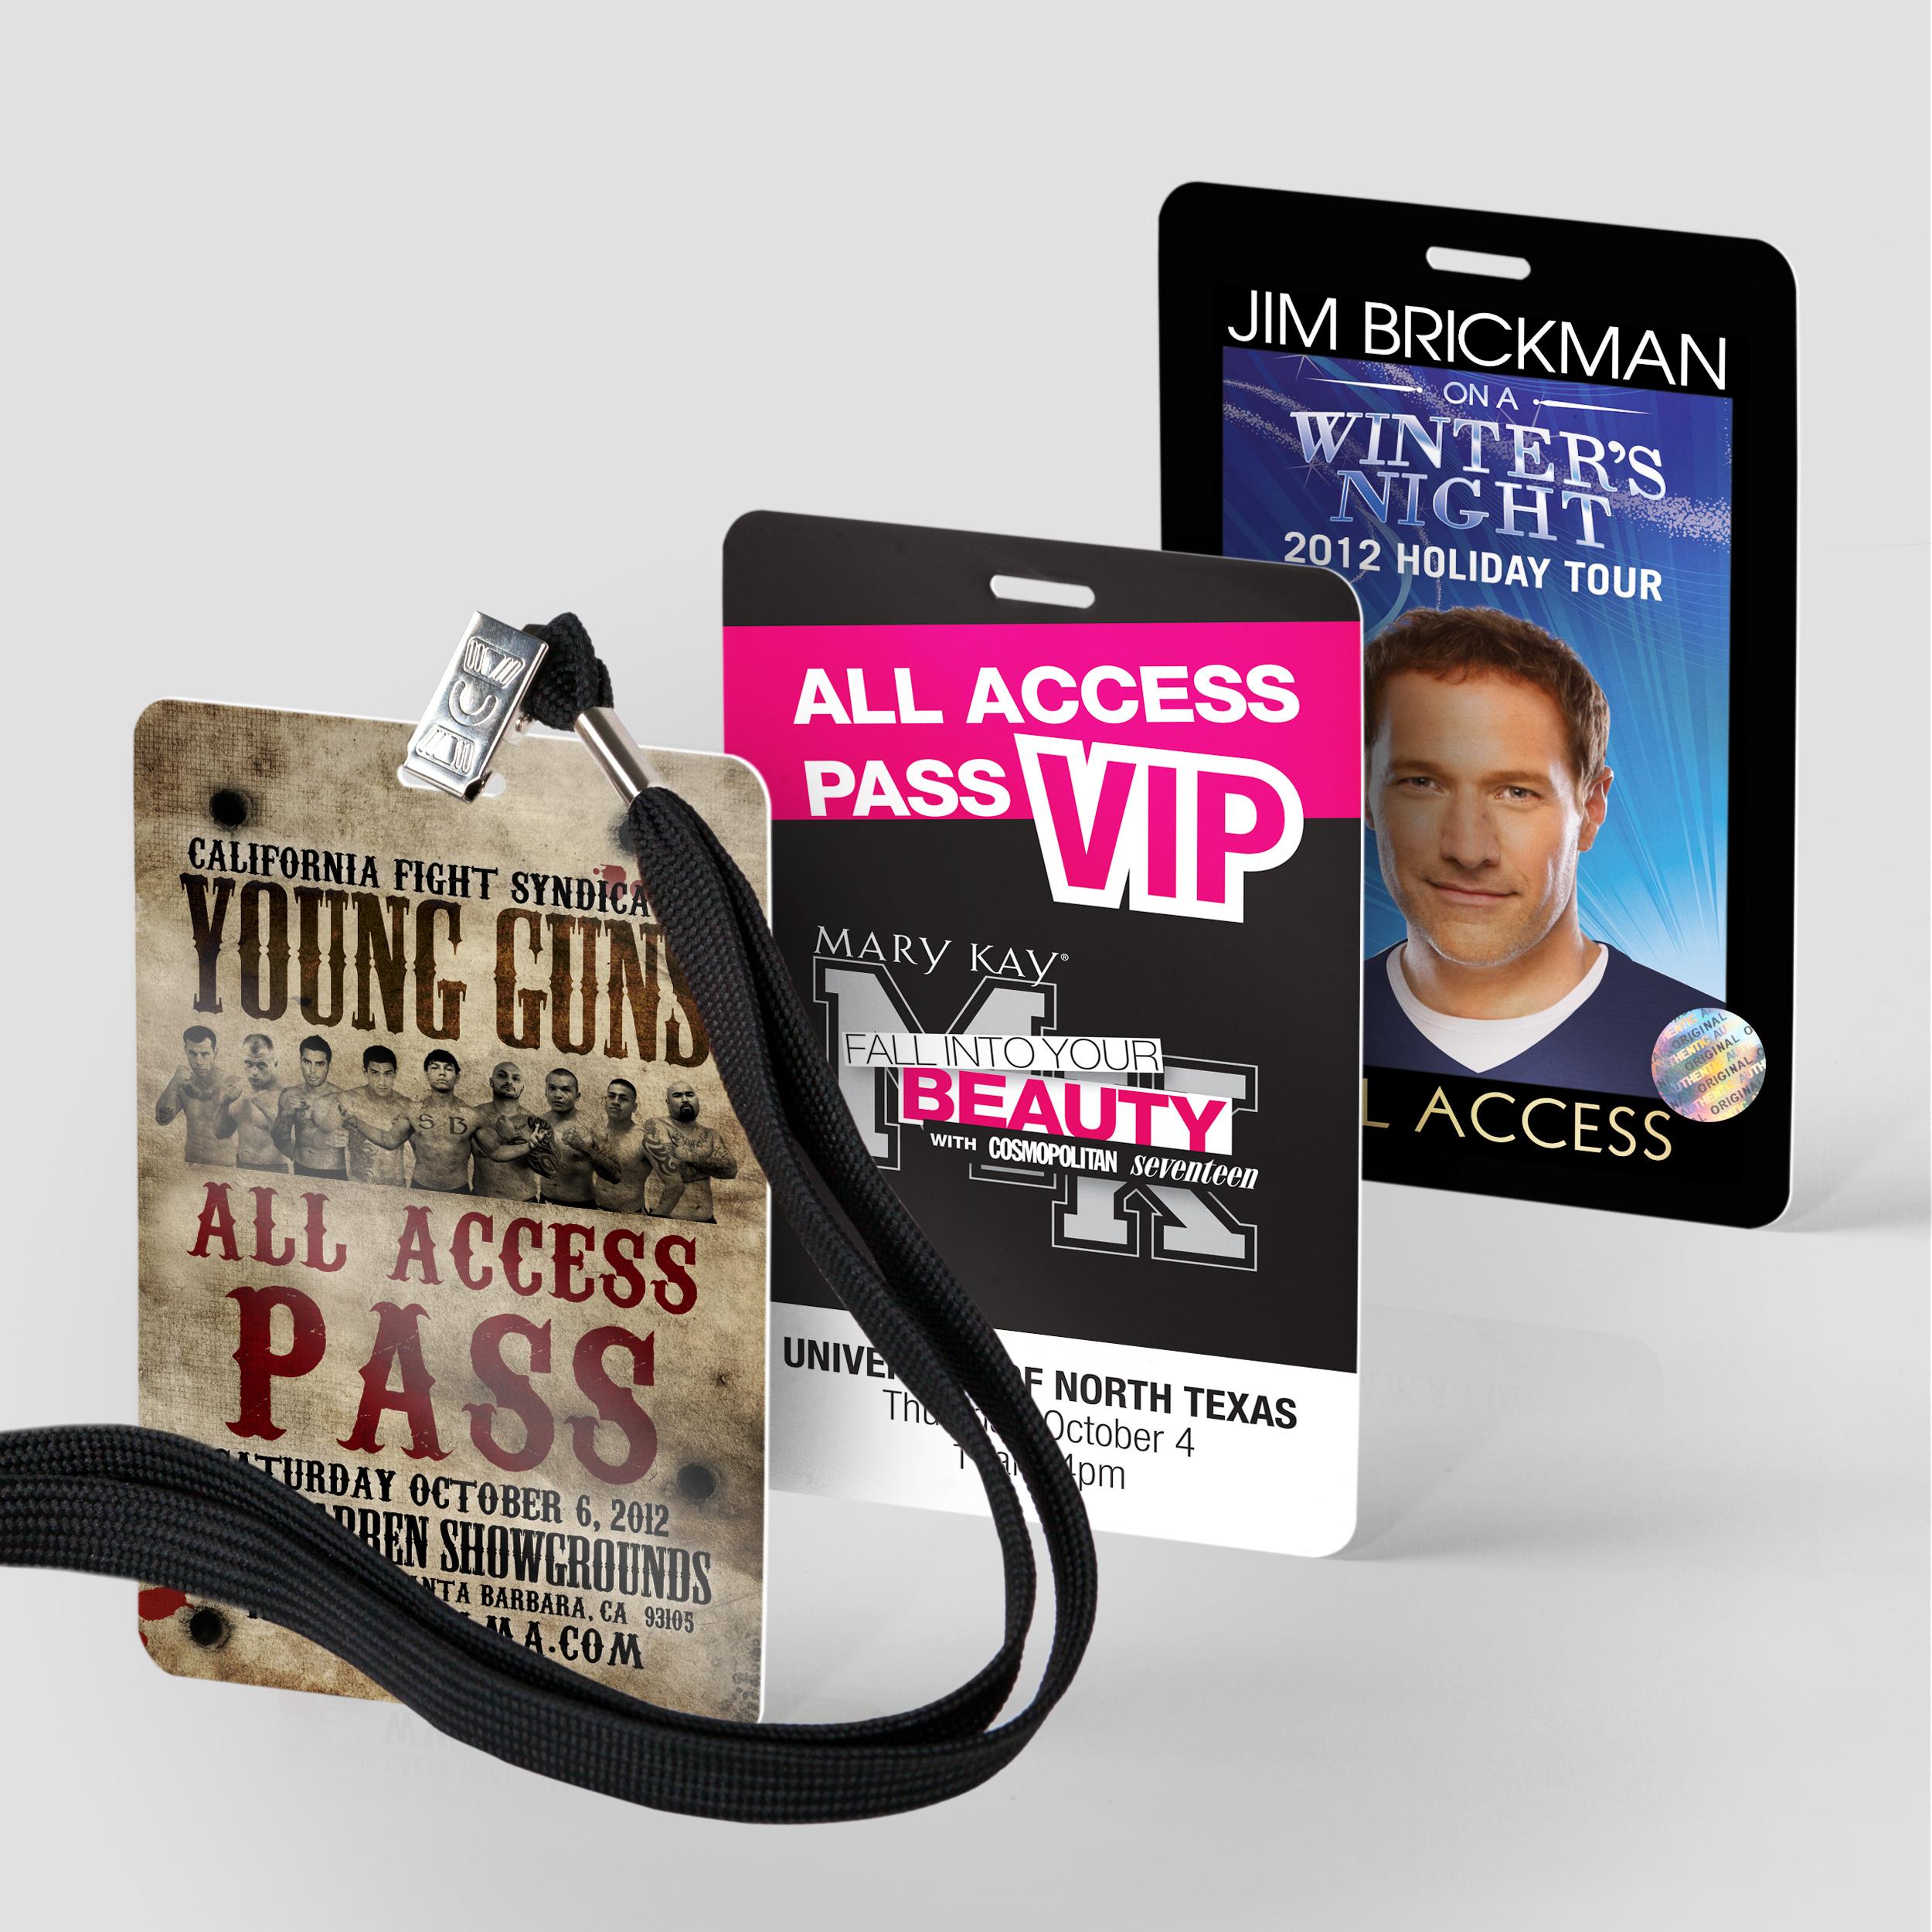 Custom Vip Passes Tour Laminates And Vip Cards